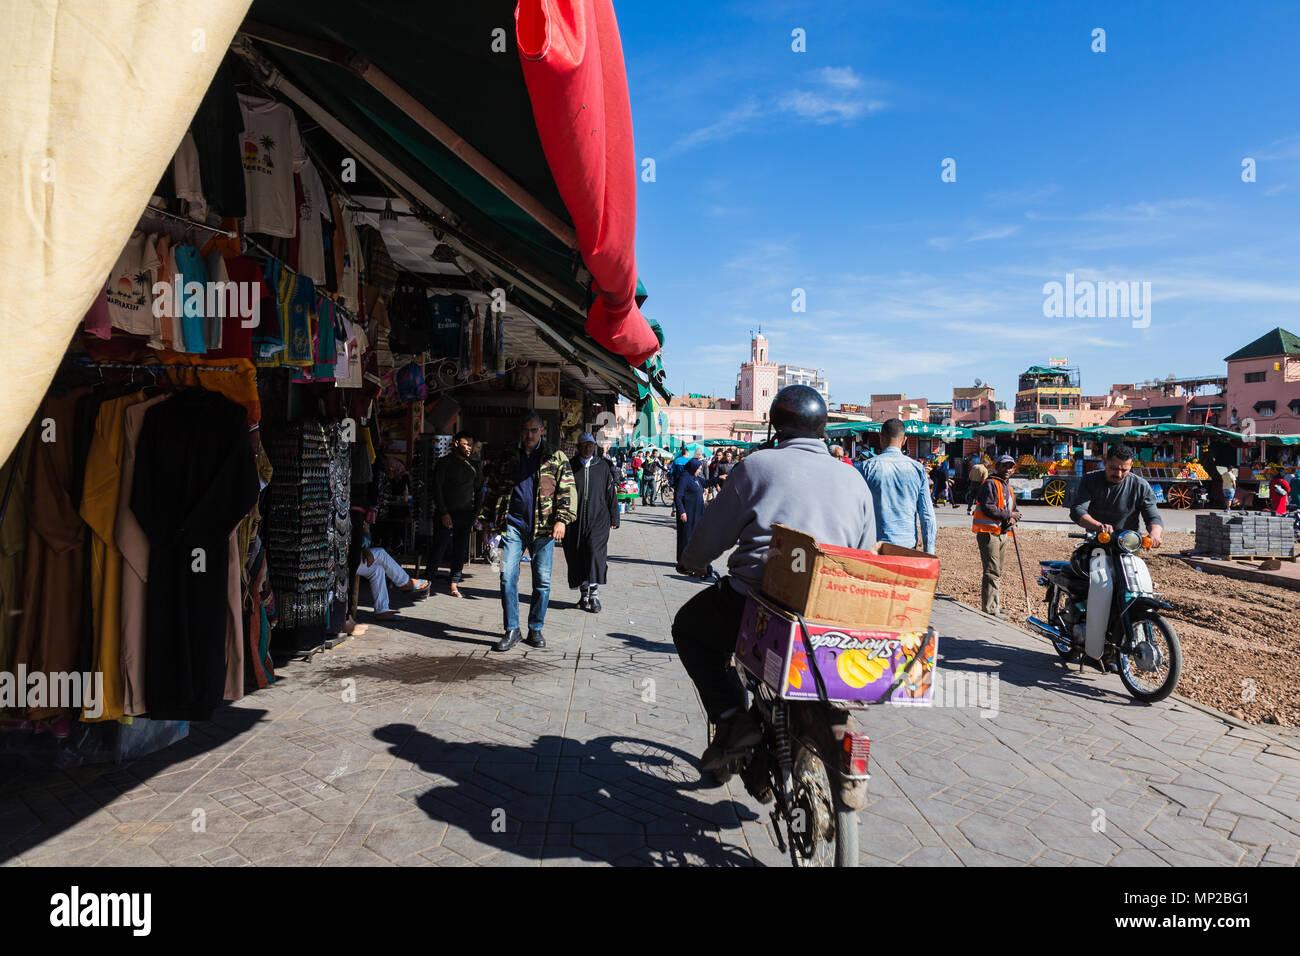 Jamaa el Fna Market square, Marrakech, Morocco. Stock Photo